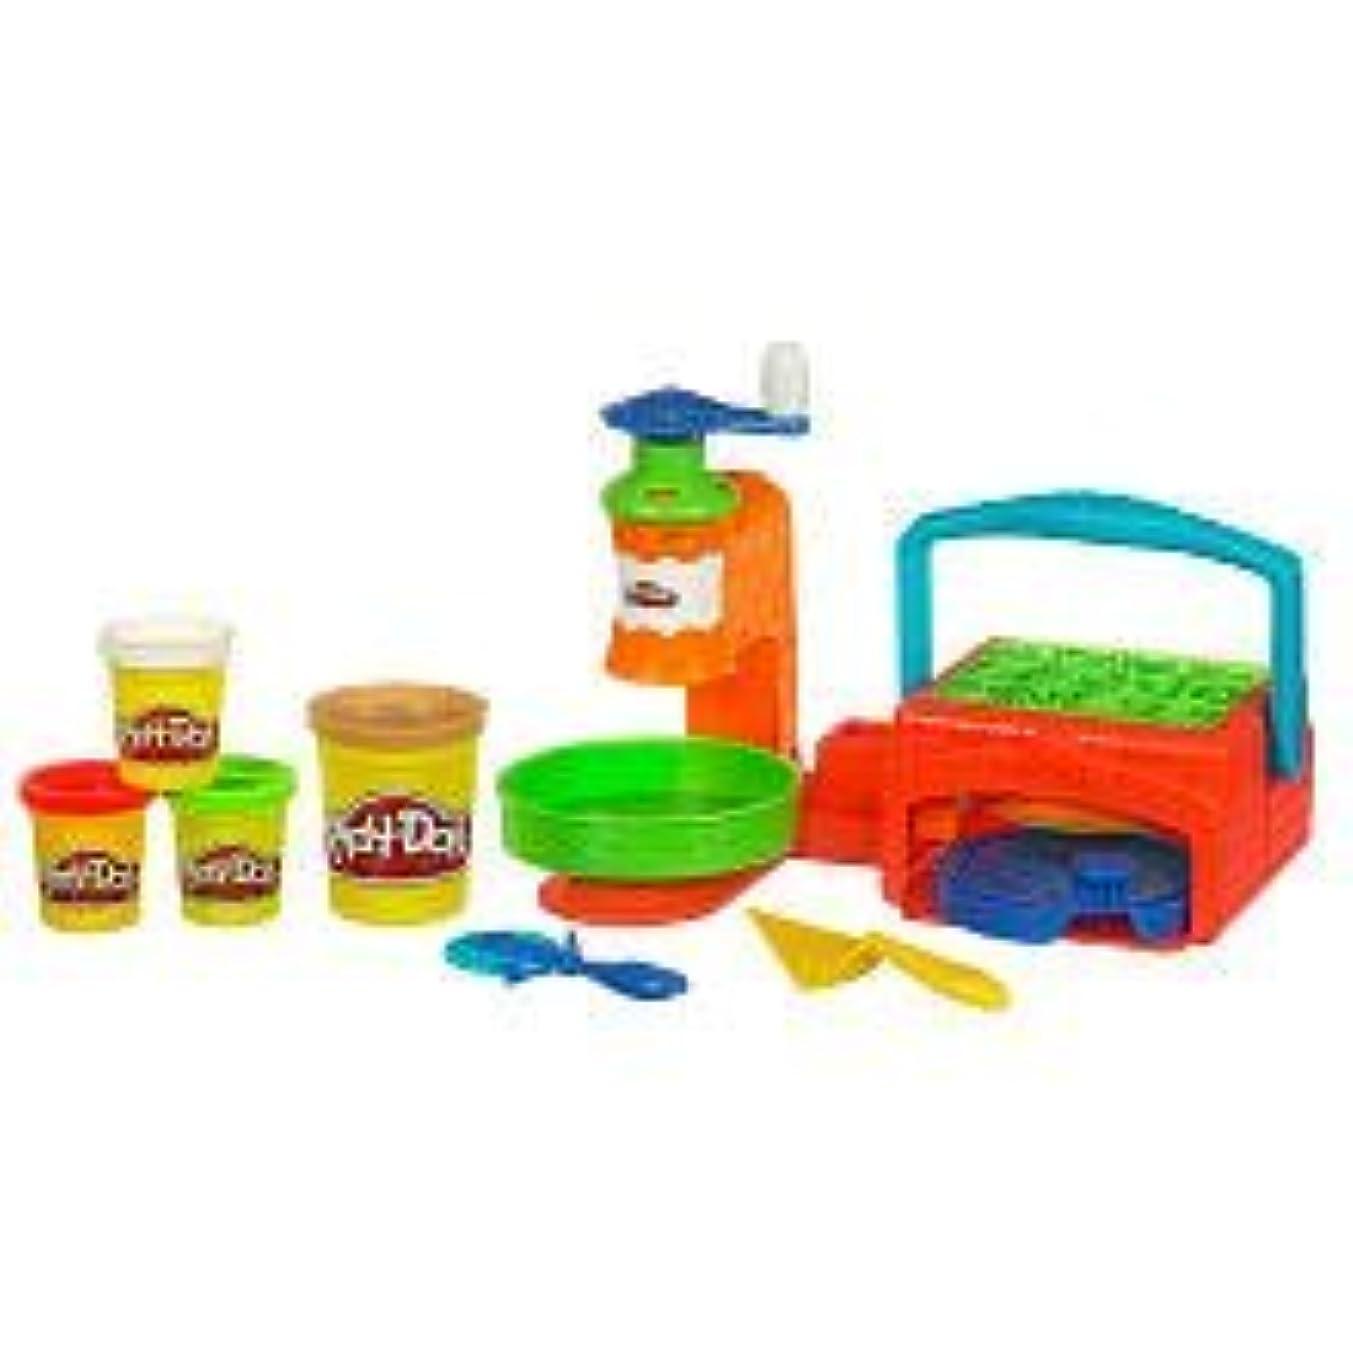 Twirl N Top Pizza Shop by Play-Doh [並行輸入品]